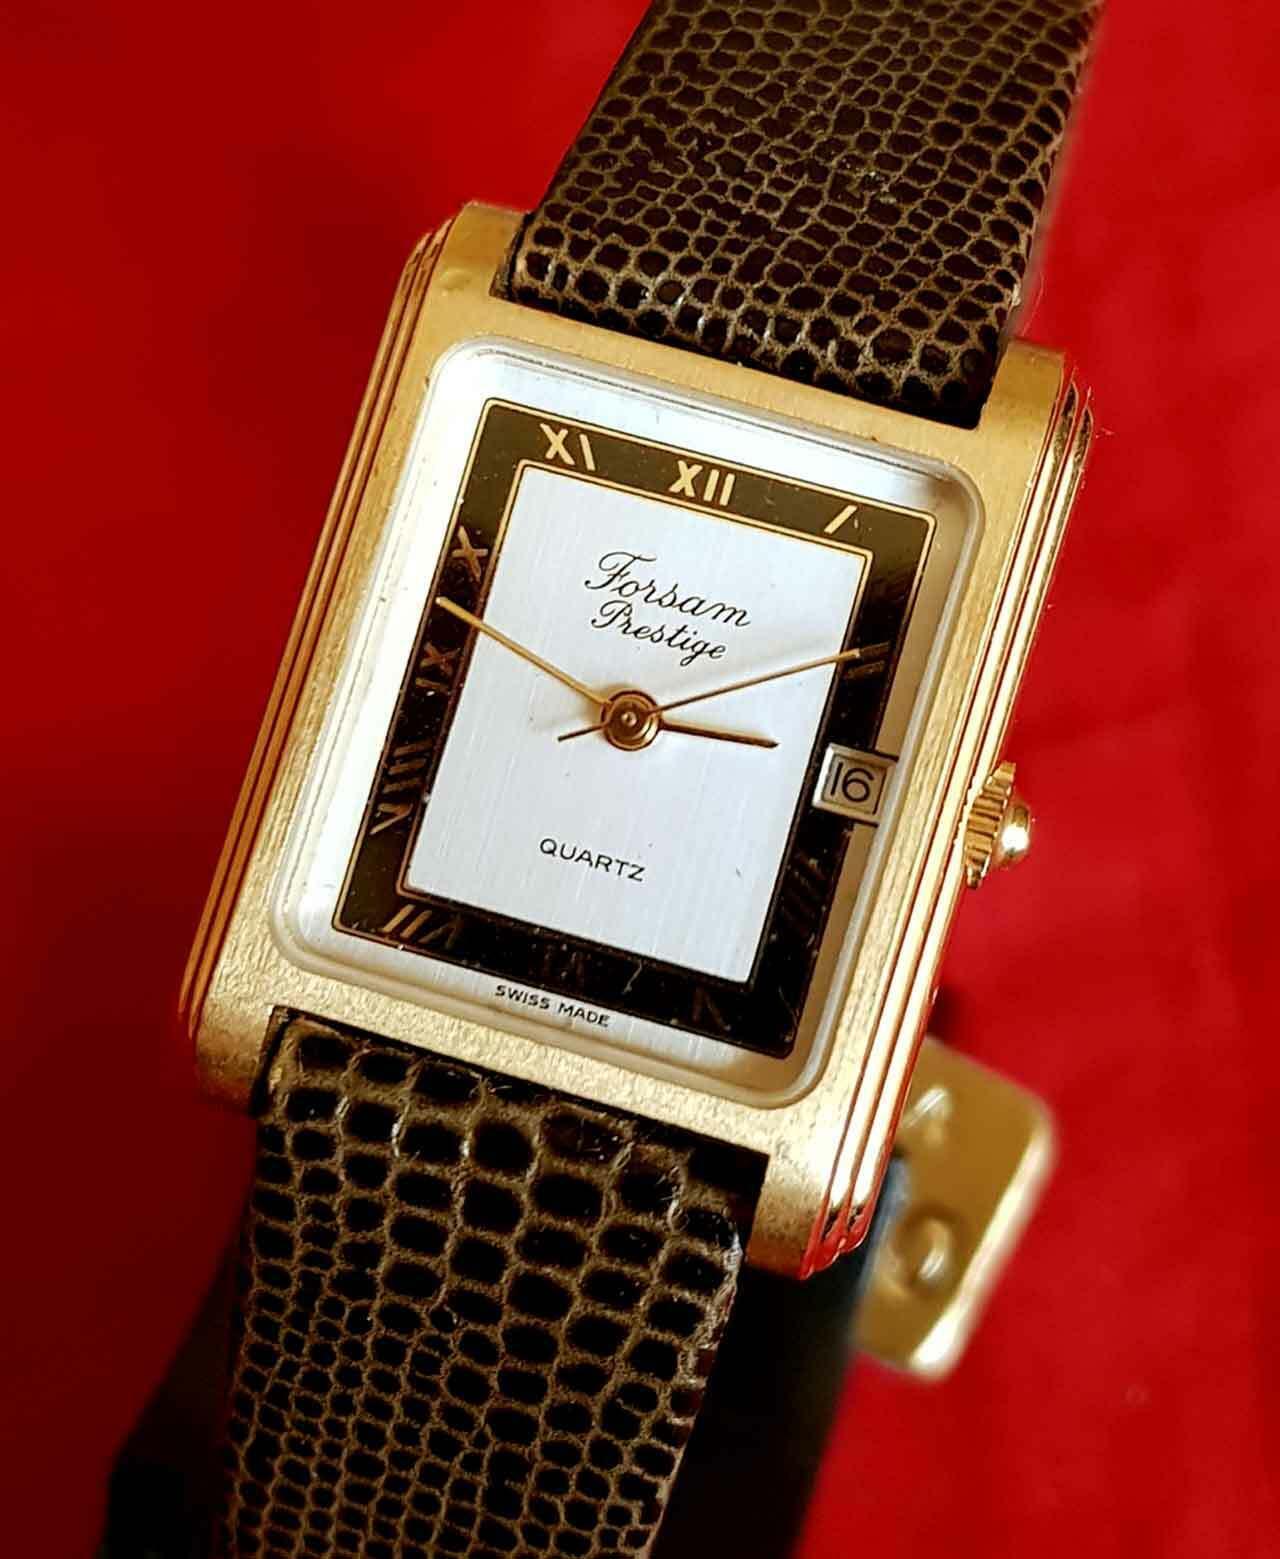 Reloj FORSAM PRESTIGE, Swiss made, vintage, NOS (new old stock)